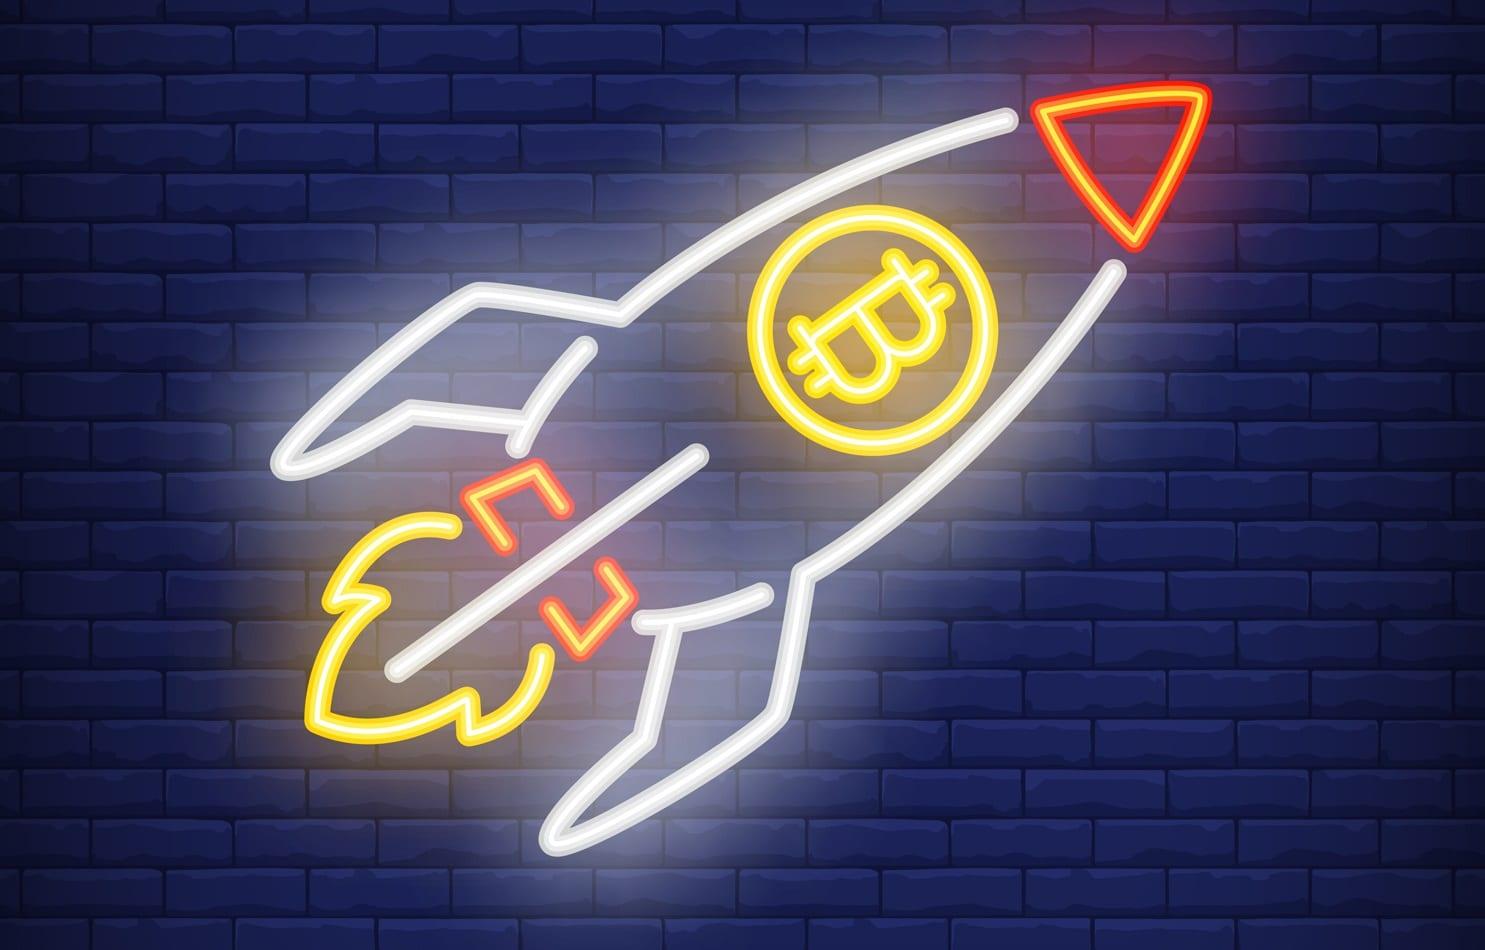 Cryptocurrency Market Awakening: Bitcoin Led The Bull Rally